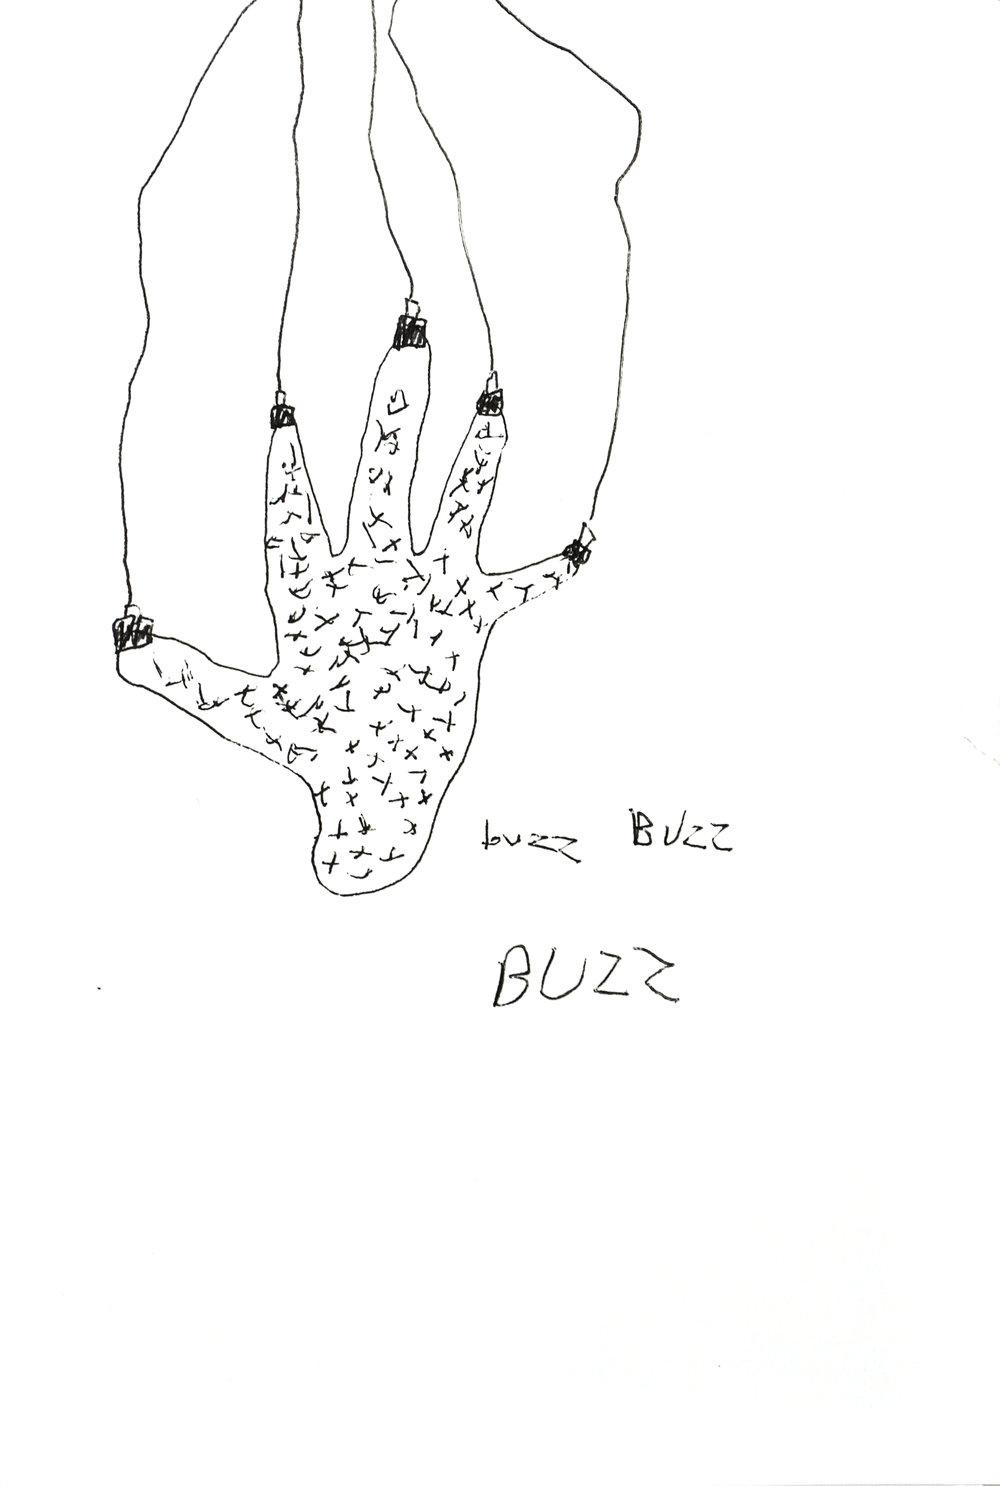 "buzz Buzz BUZZ, 2016  6""x9"" ink on paper"